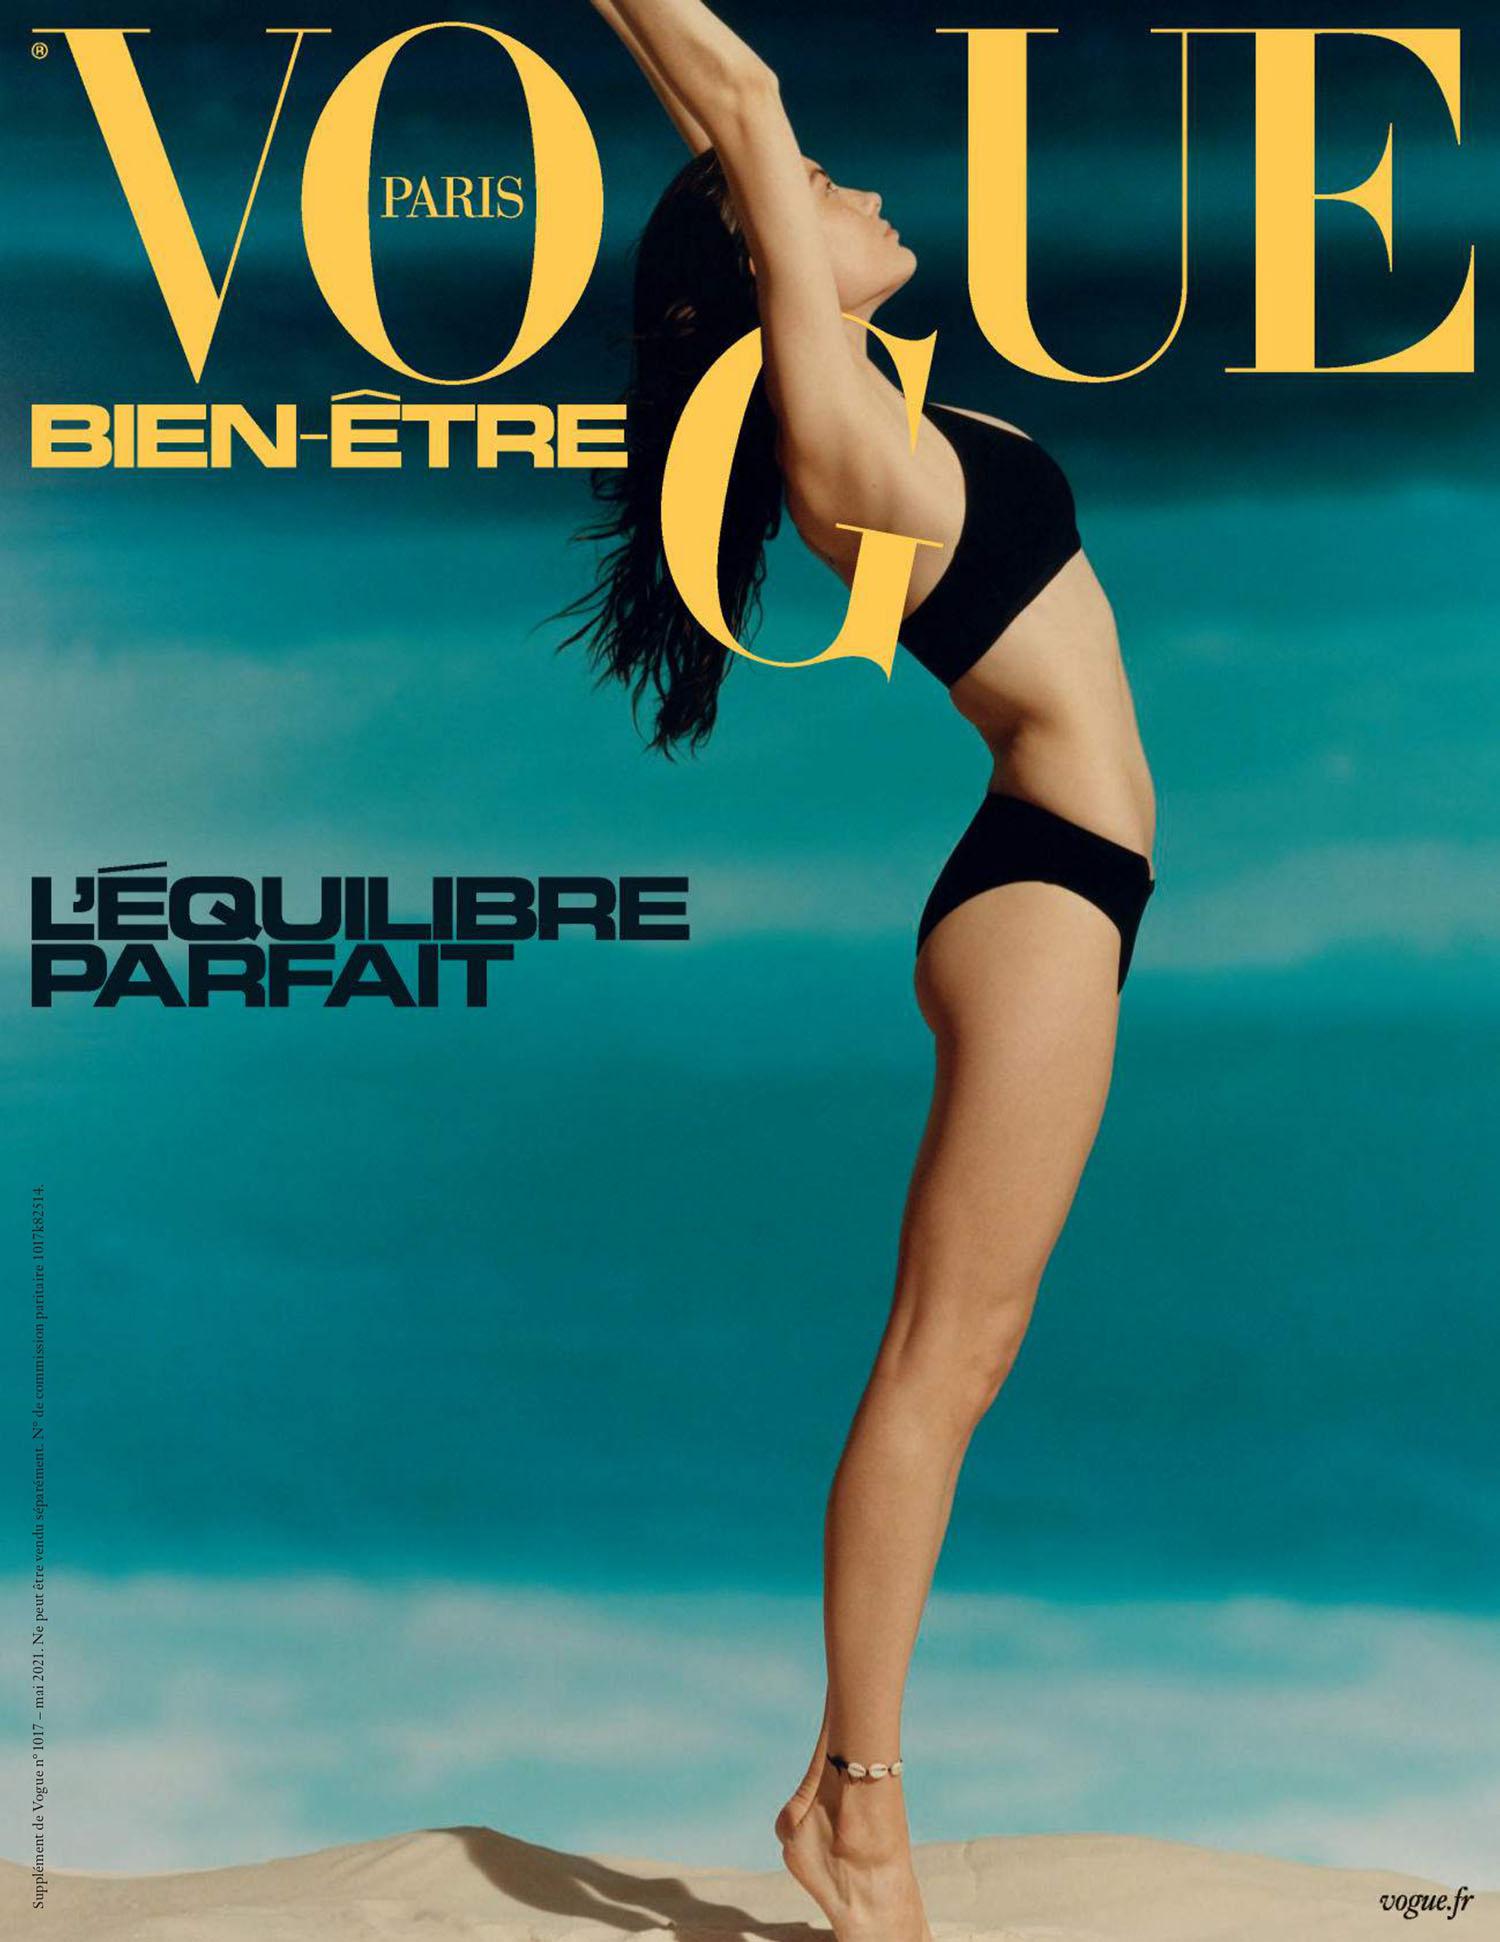 Caroline Knudsen covers Vogue Wellness Paris May 2021 by Charles Negre